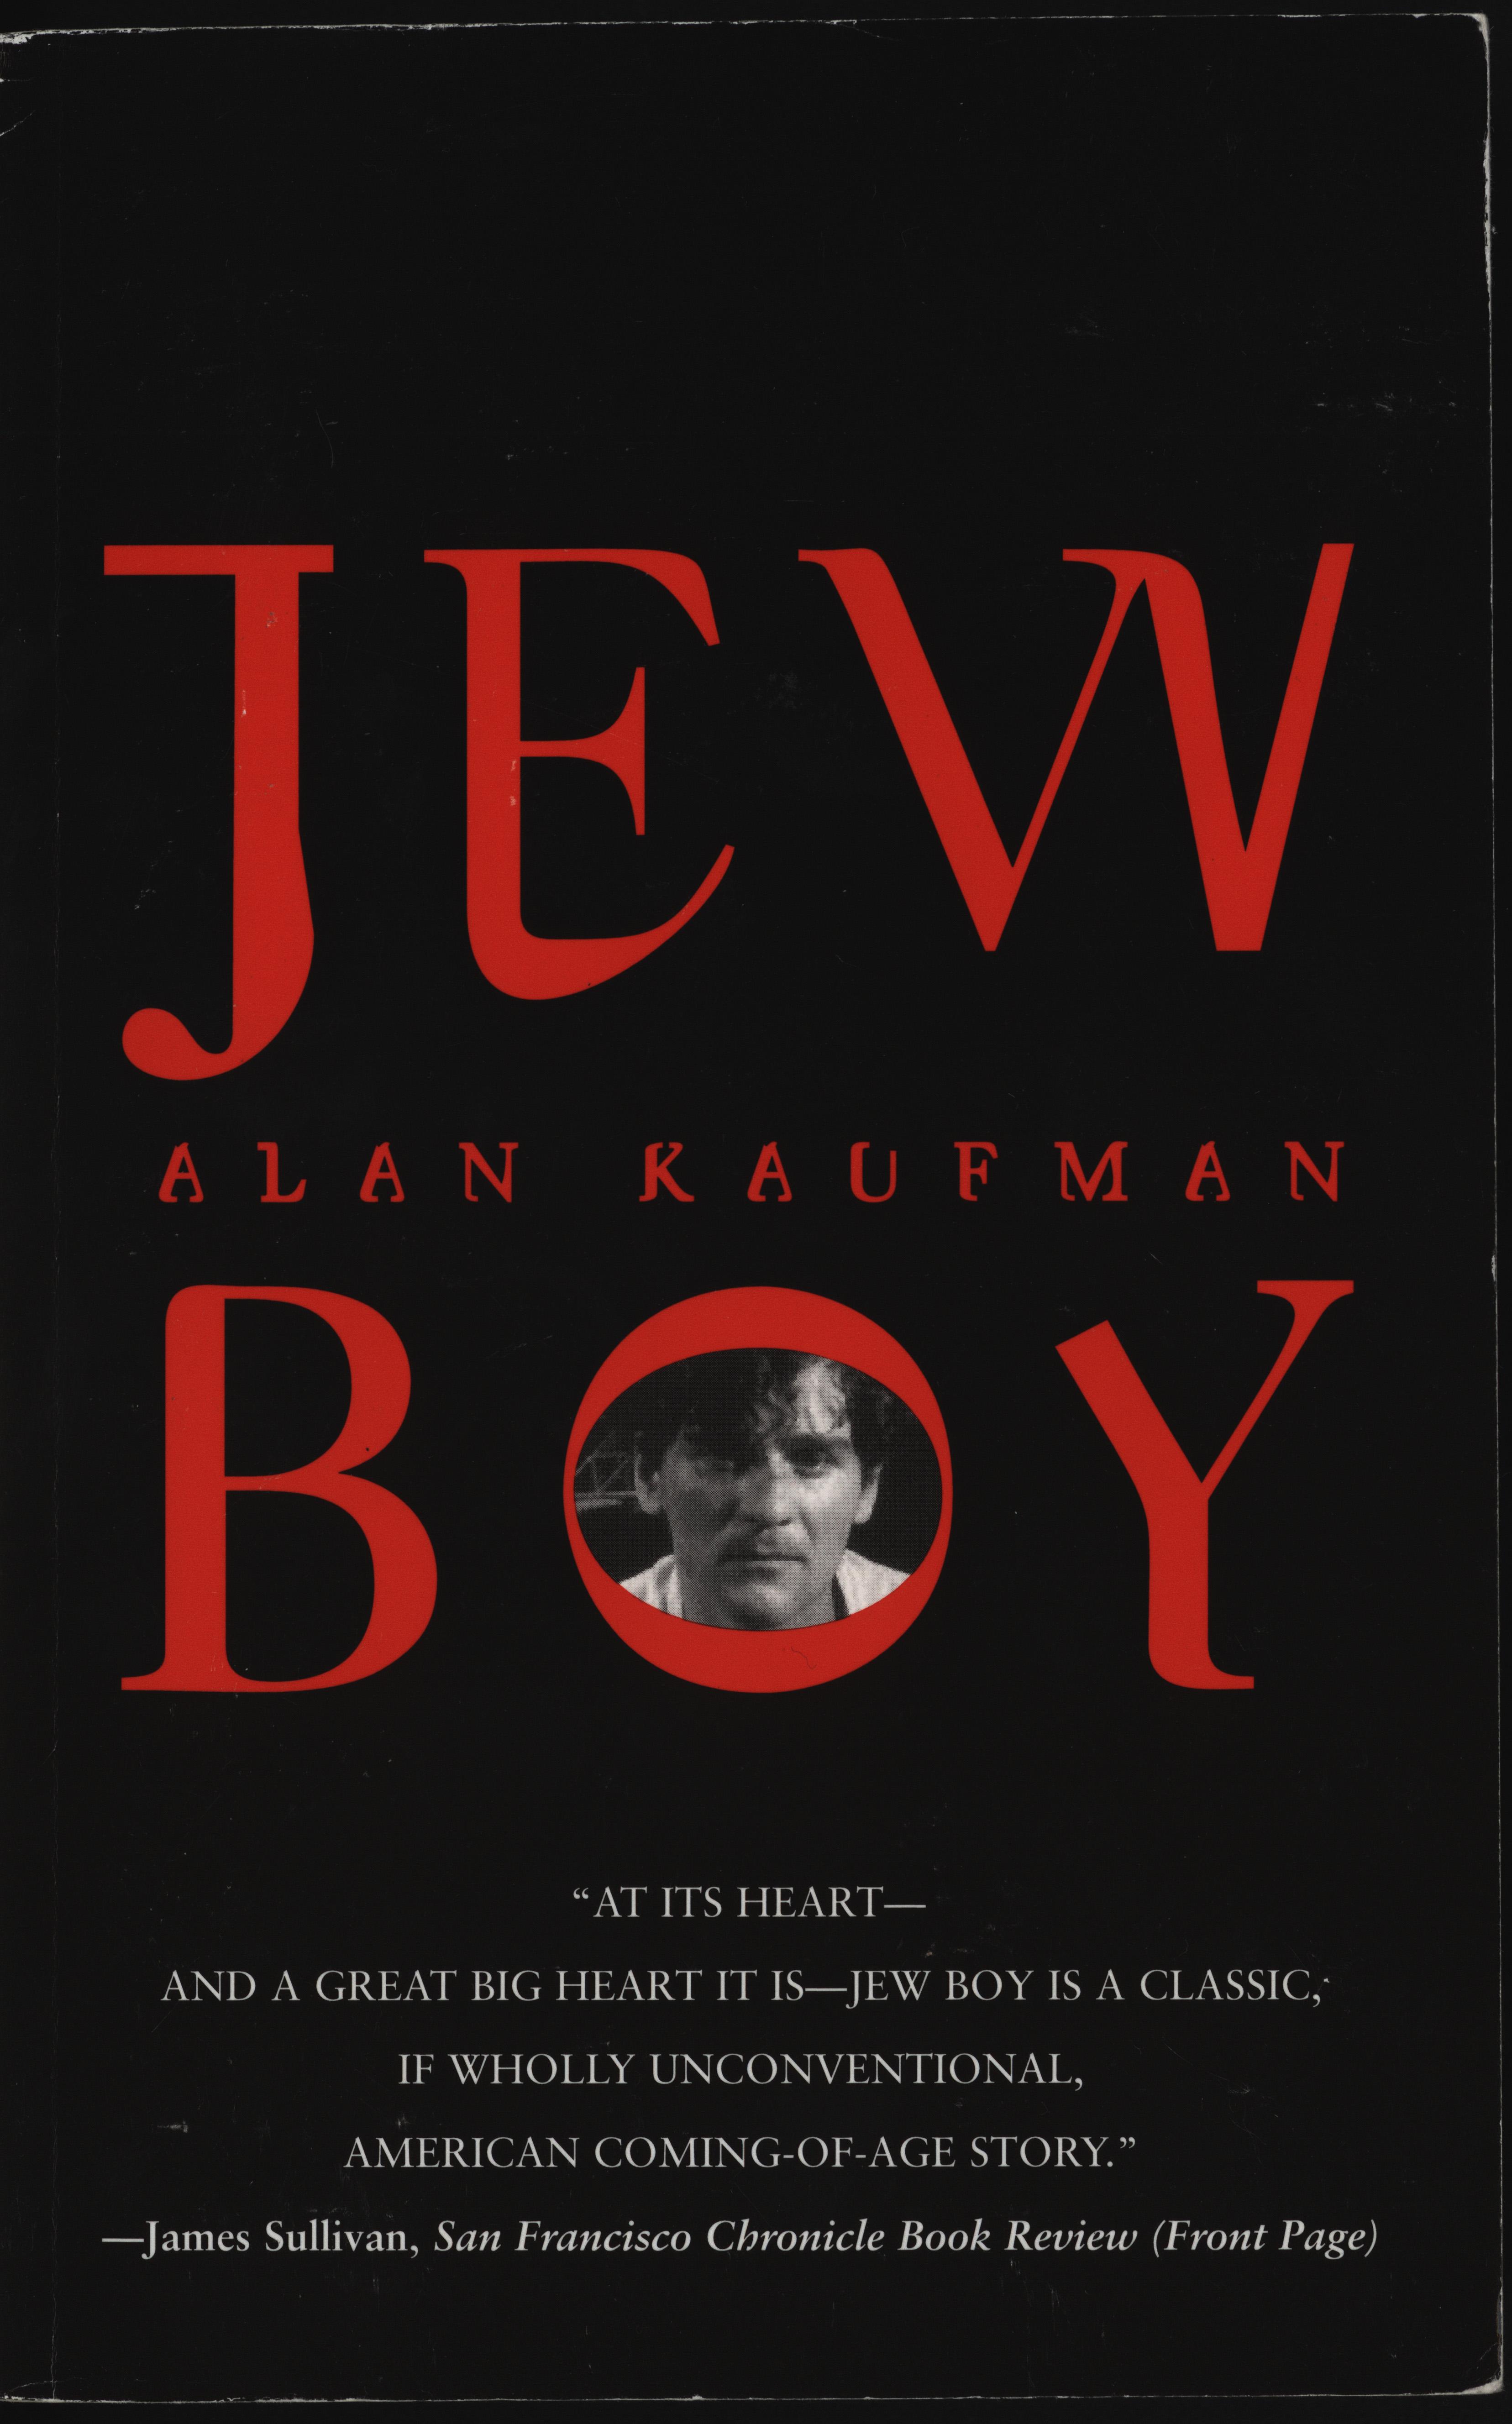 Kaufman, Alan. Jew Boy: A Memoir. New York: Foxrock, 2002. Subject